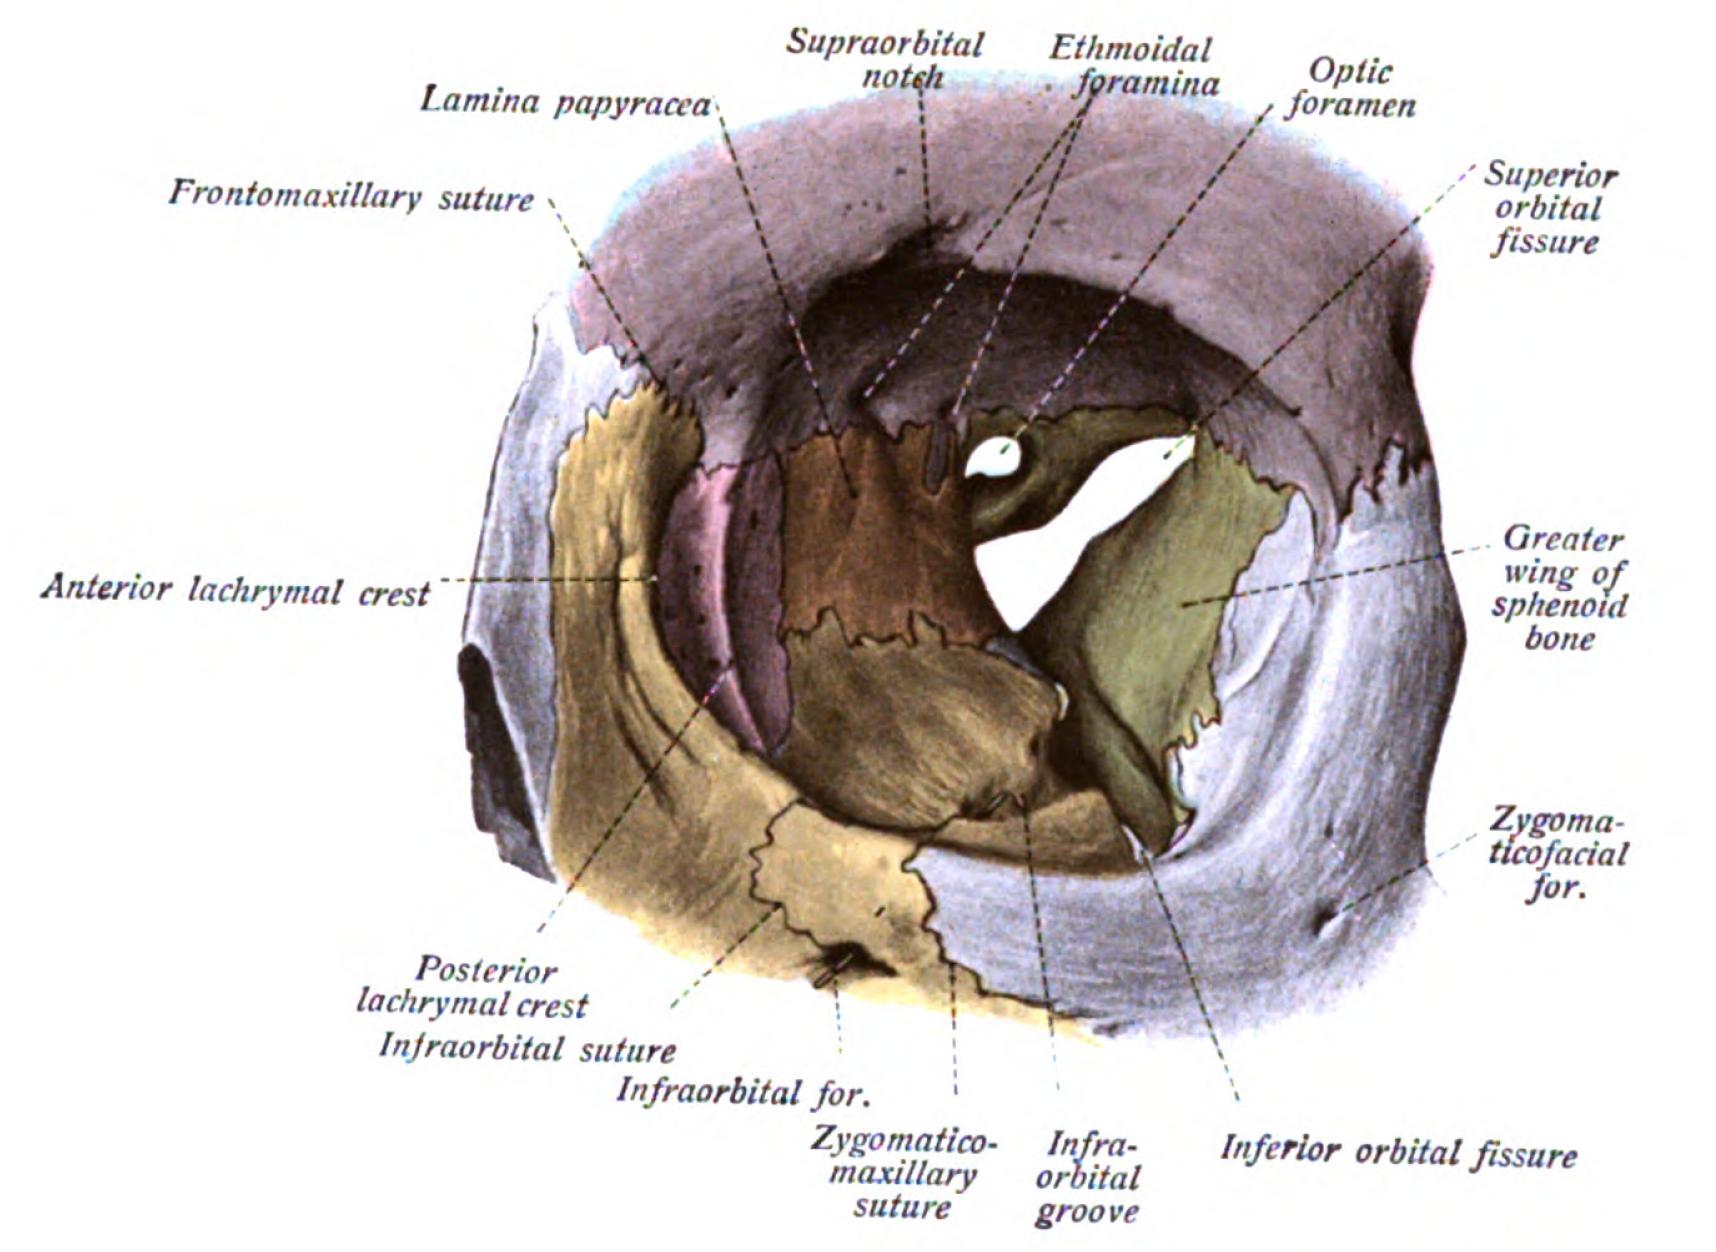 Orbital rim google opt2204 pinterest anatomy and orbital rim google ccuart Choice Image